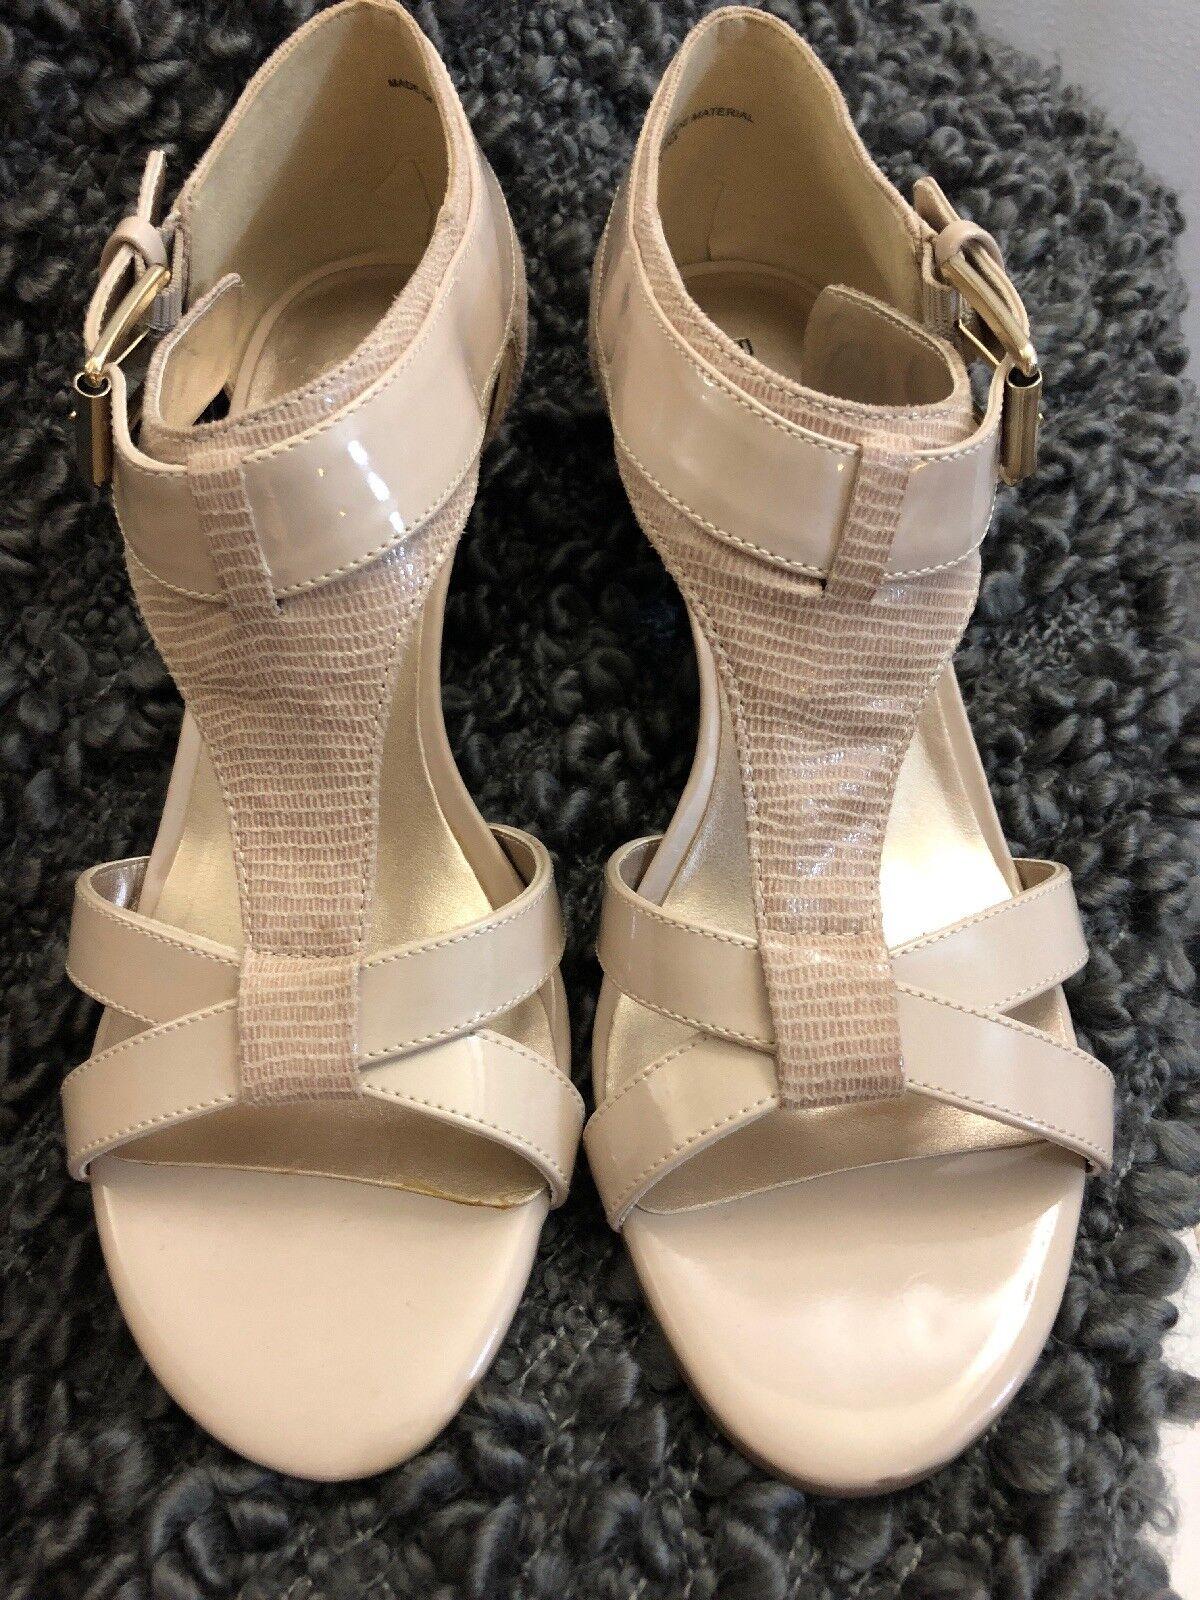 Men/Women Sales Bandolino Beige Sandals - Size 6M Fashion pattern Sales Men/Women Italy Seasonal hot sale 164511